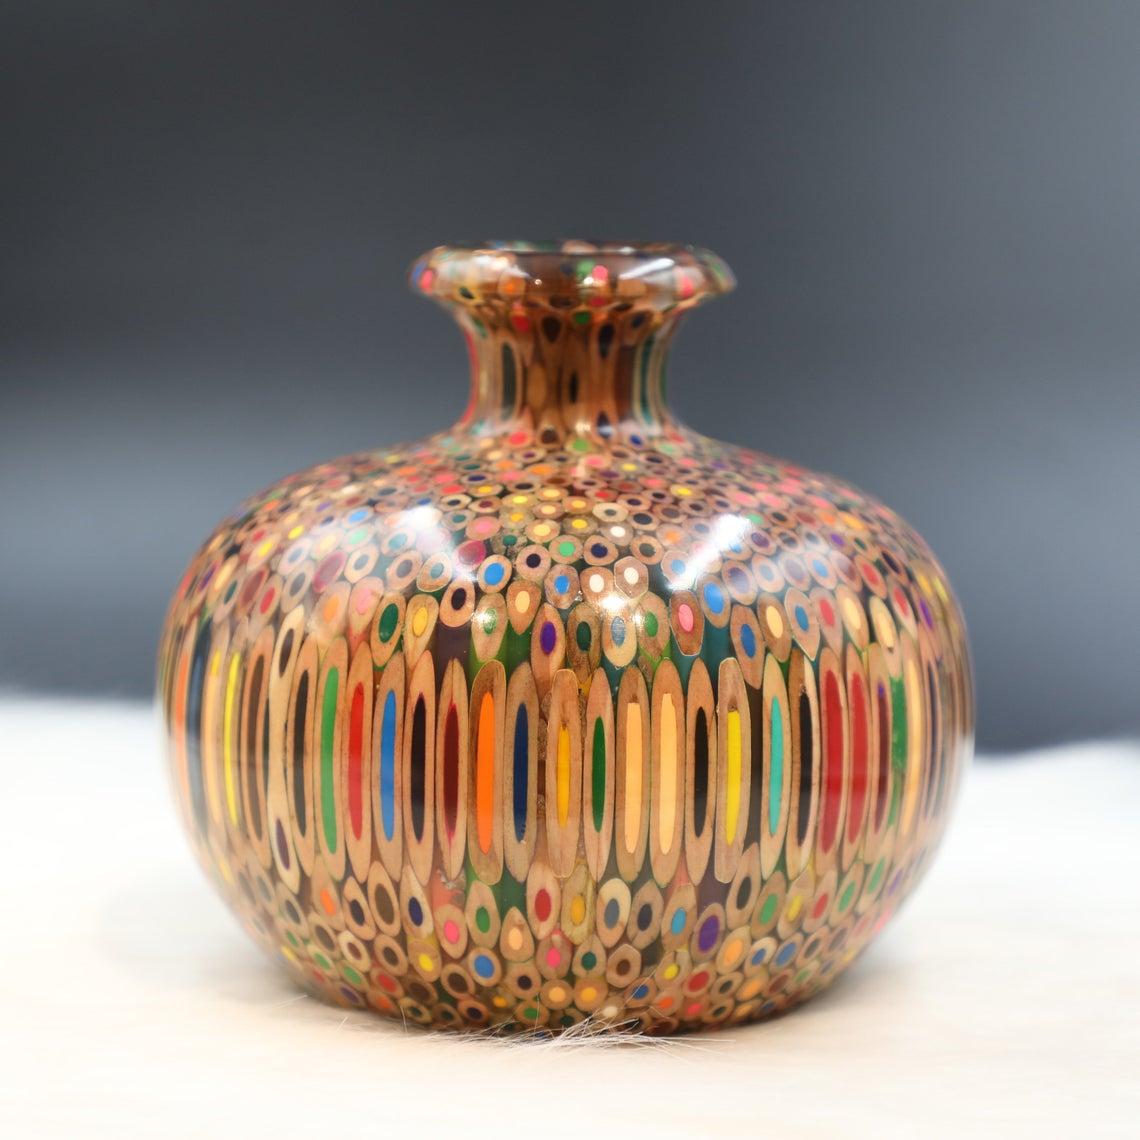 Decorative Colored-pencil Summer Wind Vase Special Edition